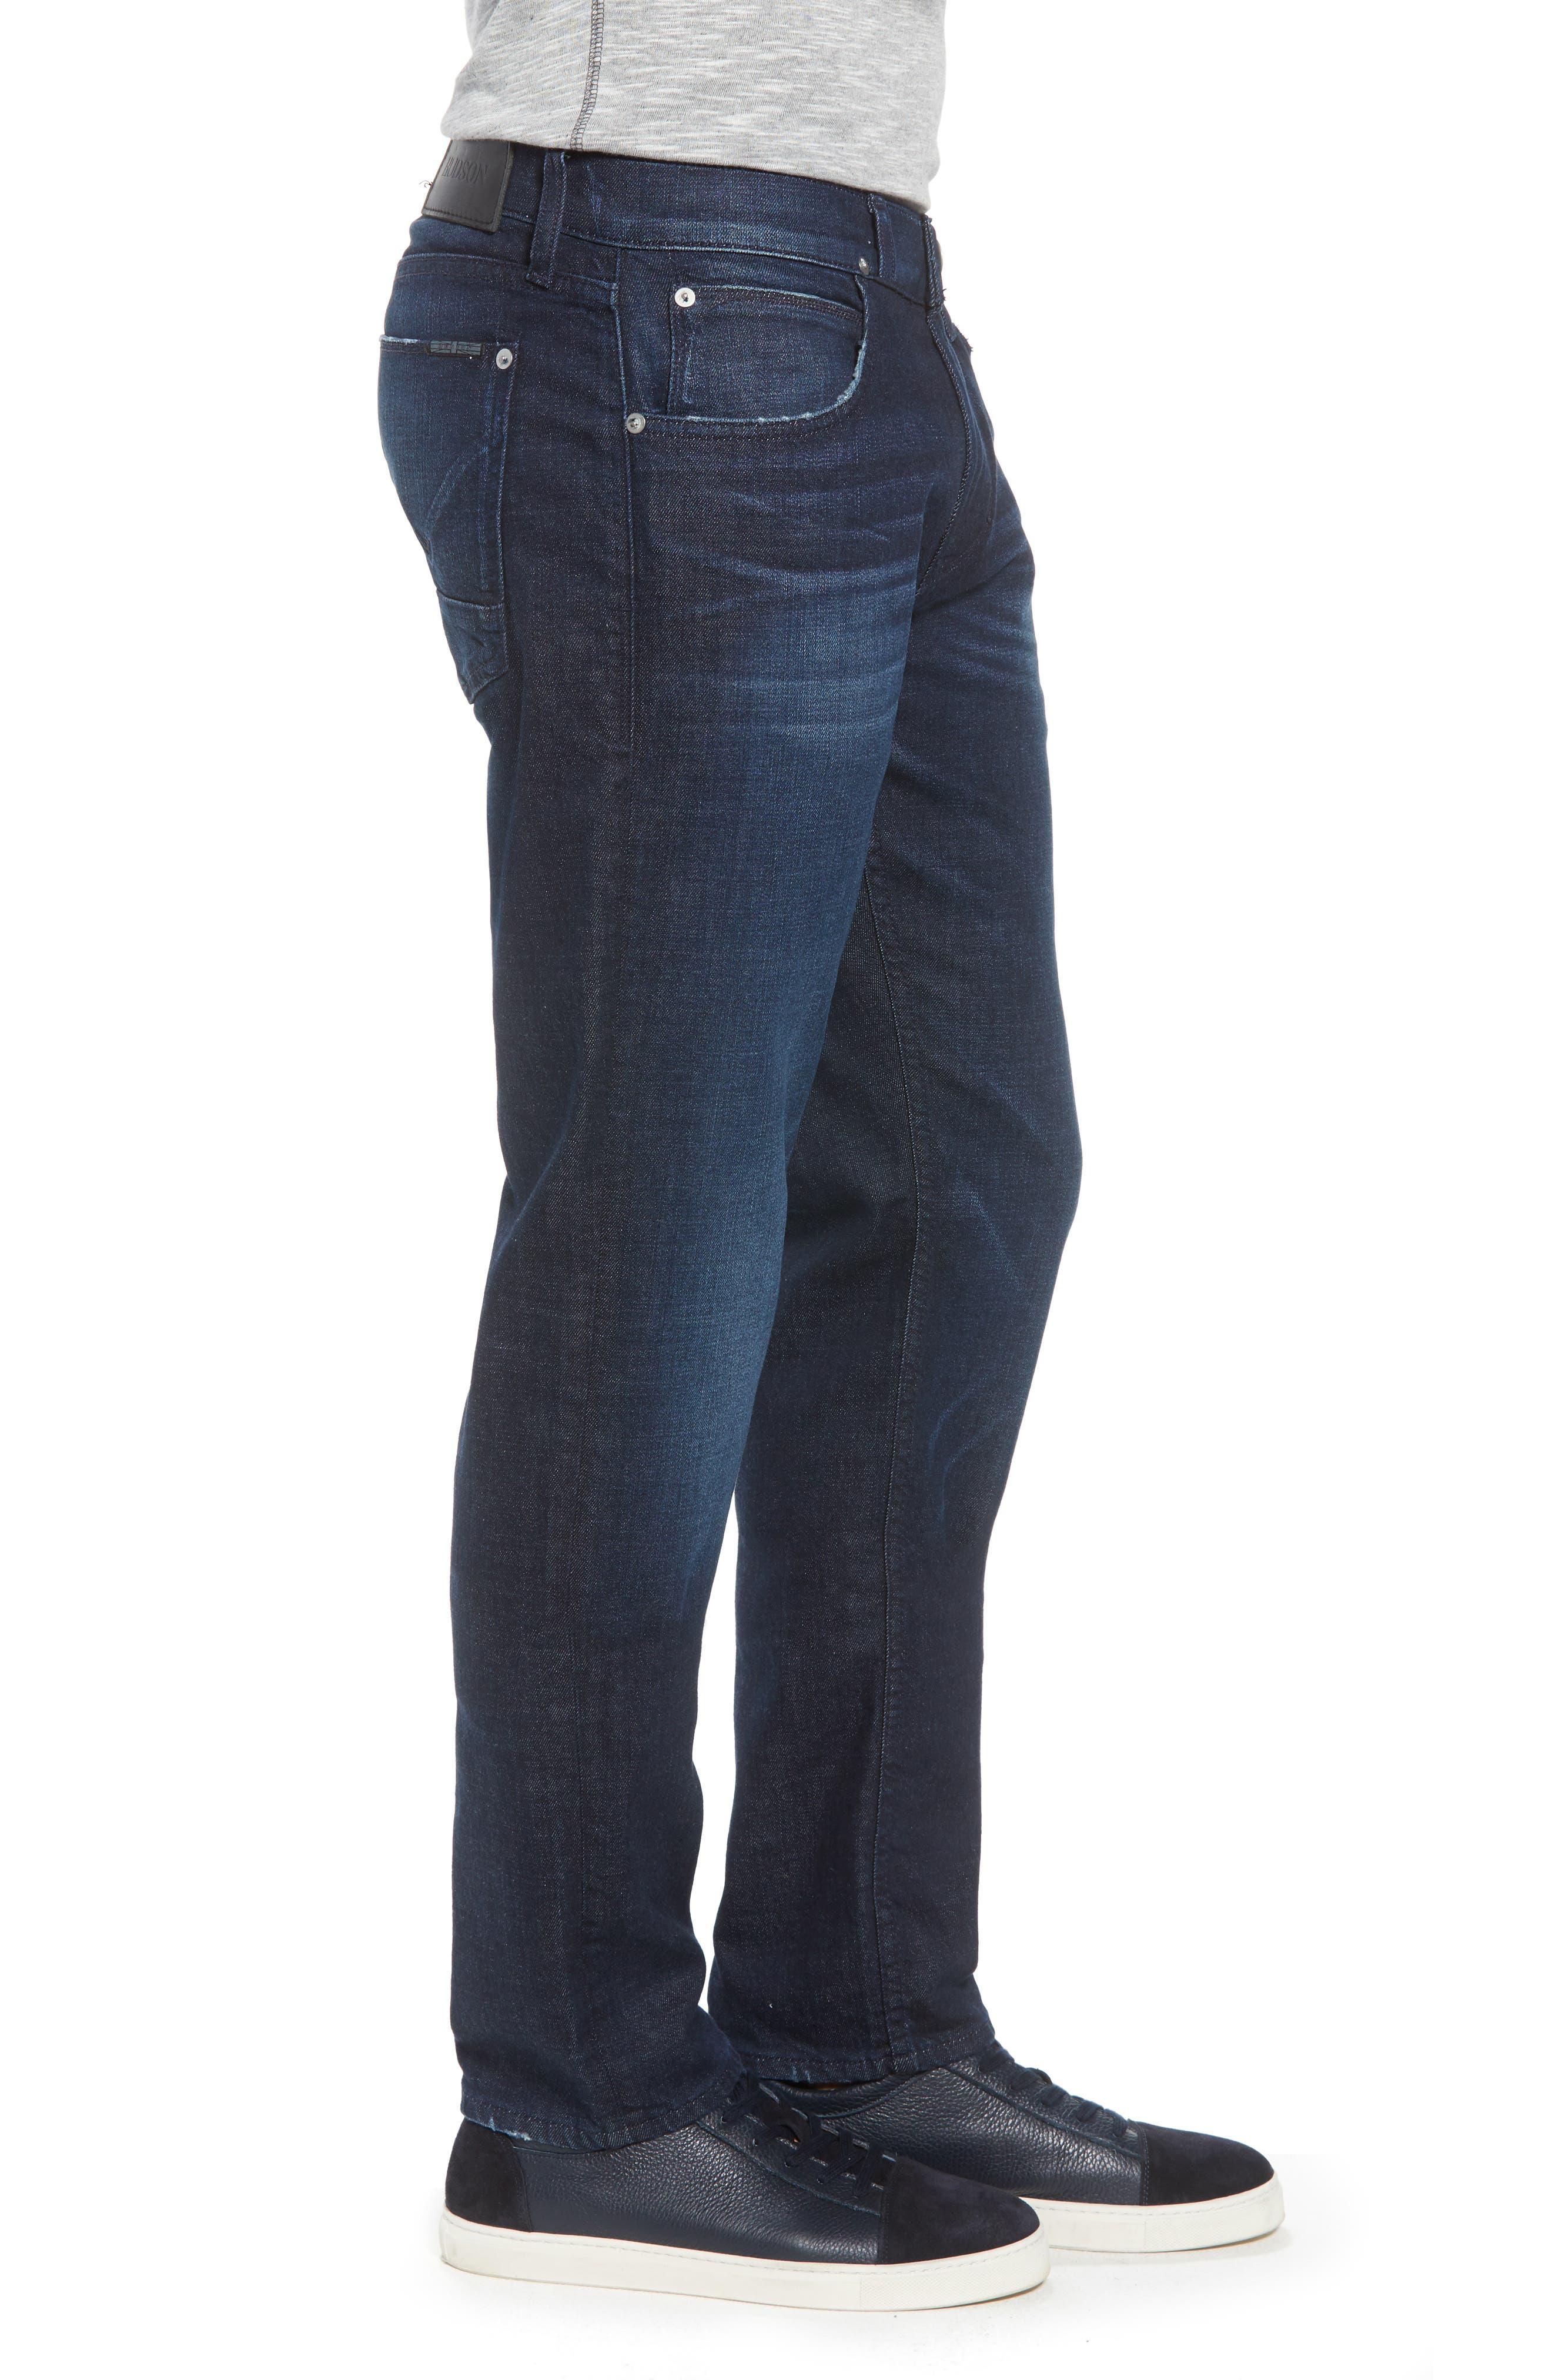 Blake Slim Fit Jeans,                             Alternate thumbnail 3, color,                             BARRY